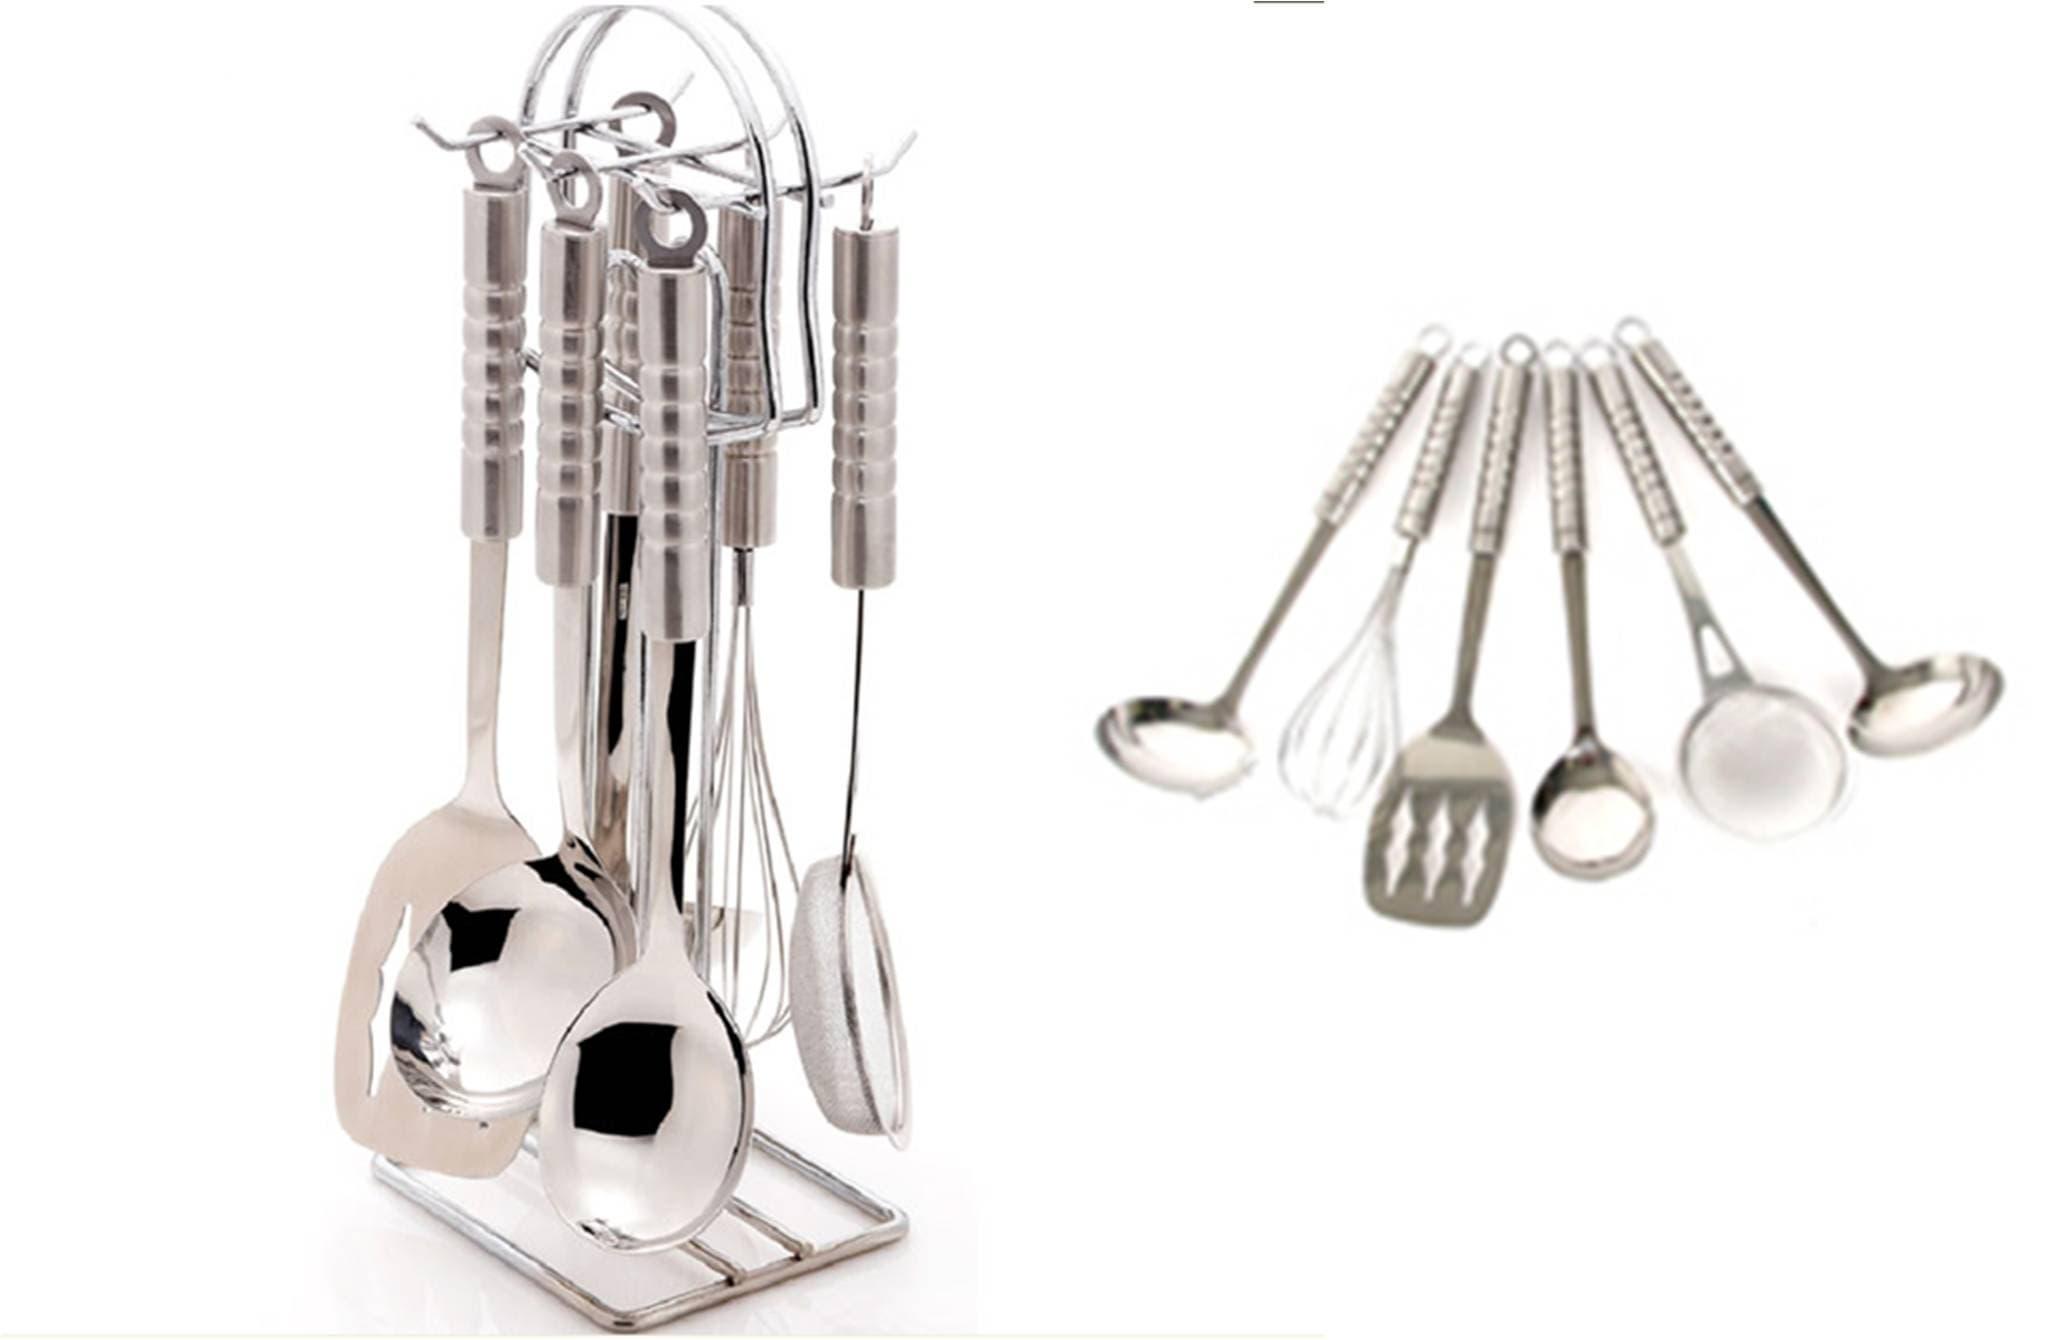 Opera Kitchen Tool Set From Gh Corporation B2b Marketplace Portal South Korea Product